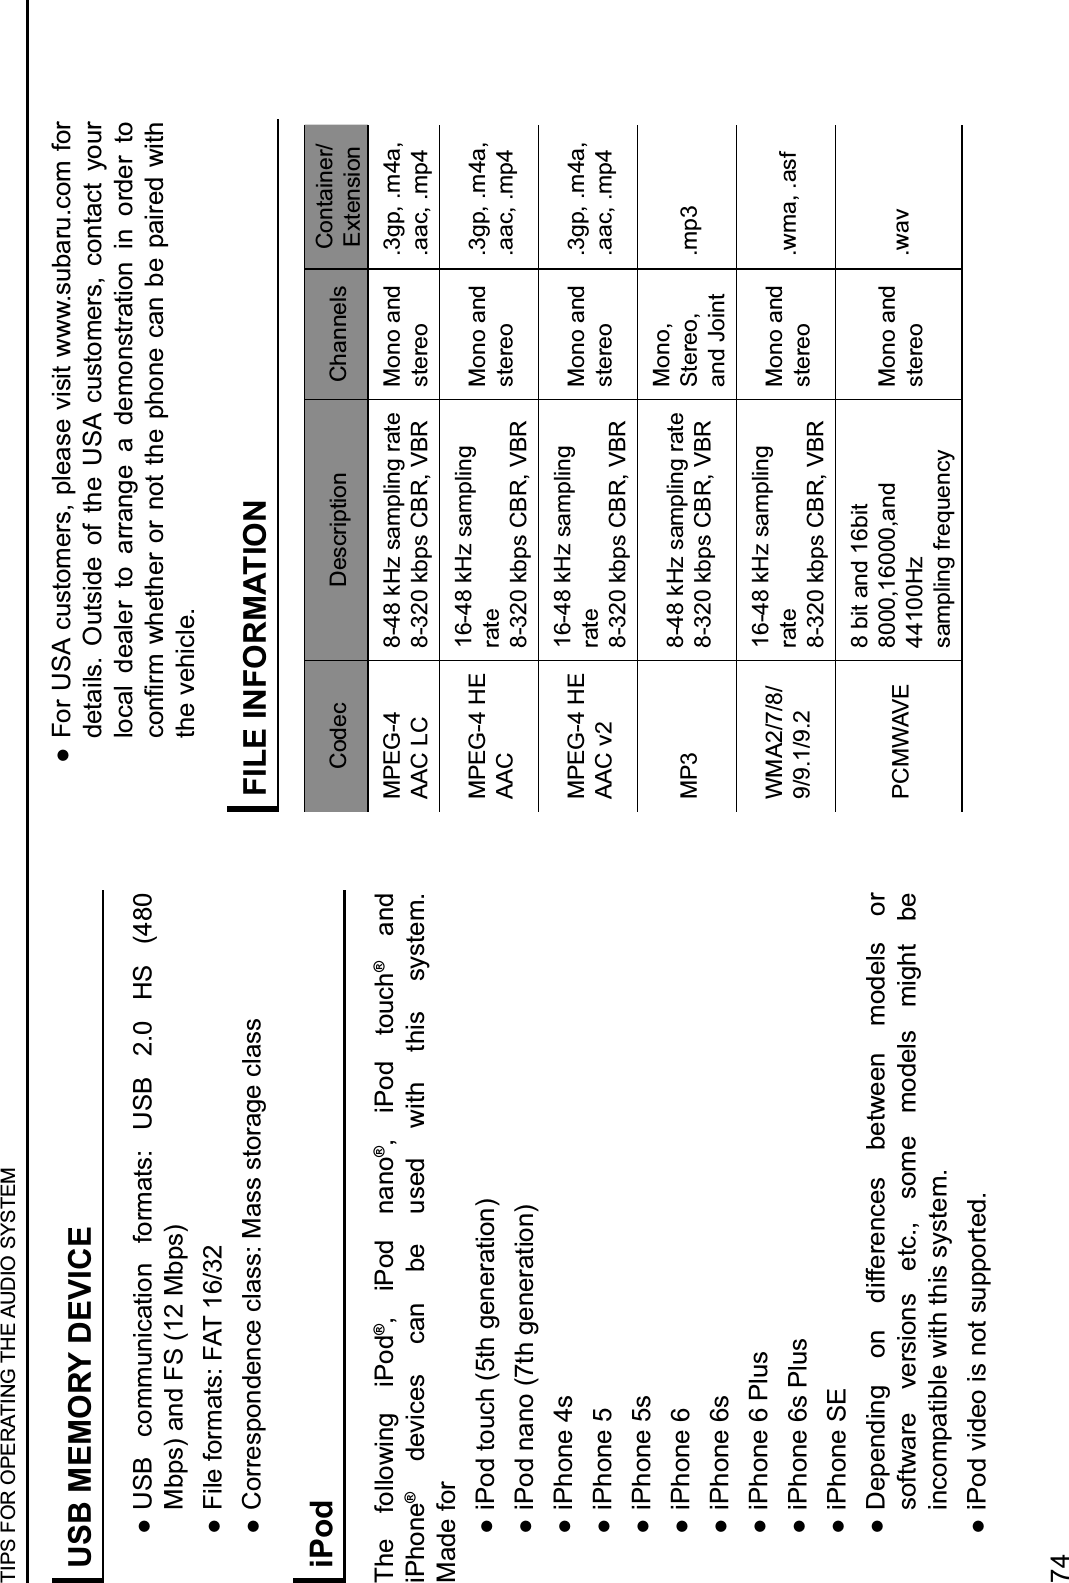 Harman BE2822 Automotive Infotainment Unit with Bluetooth